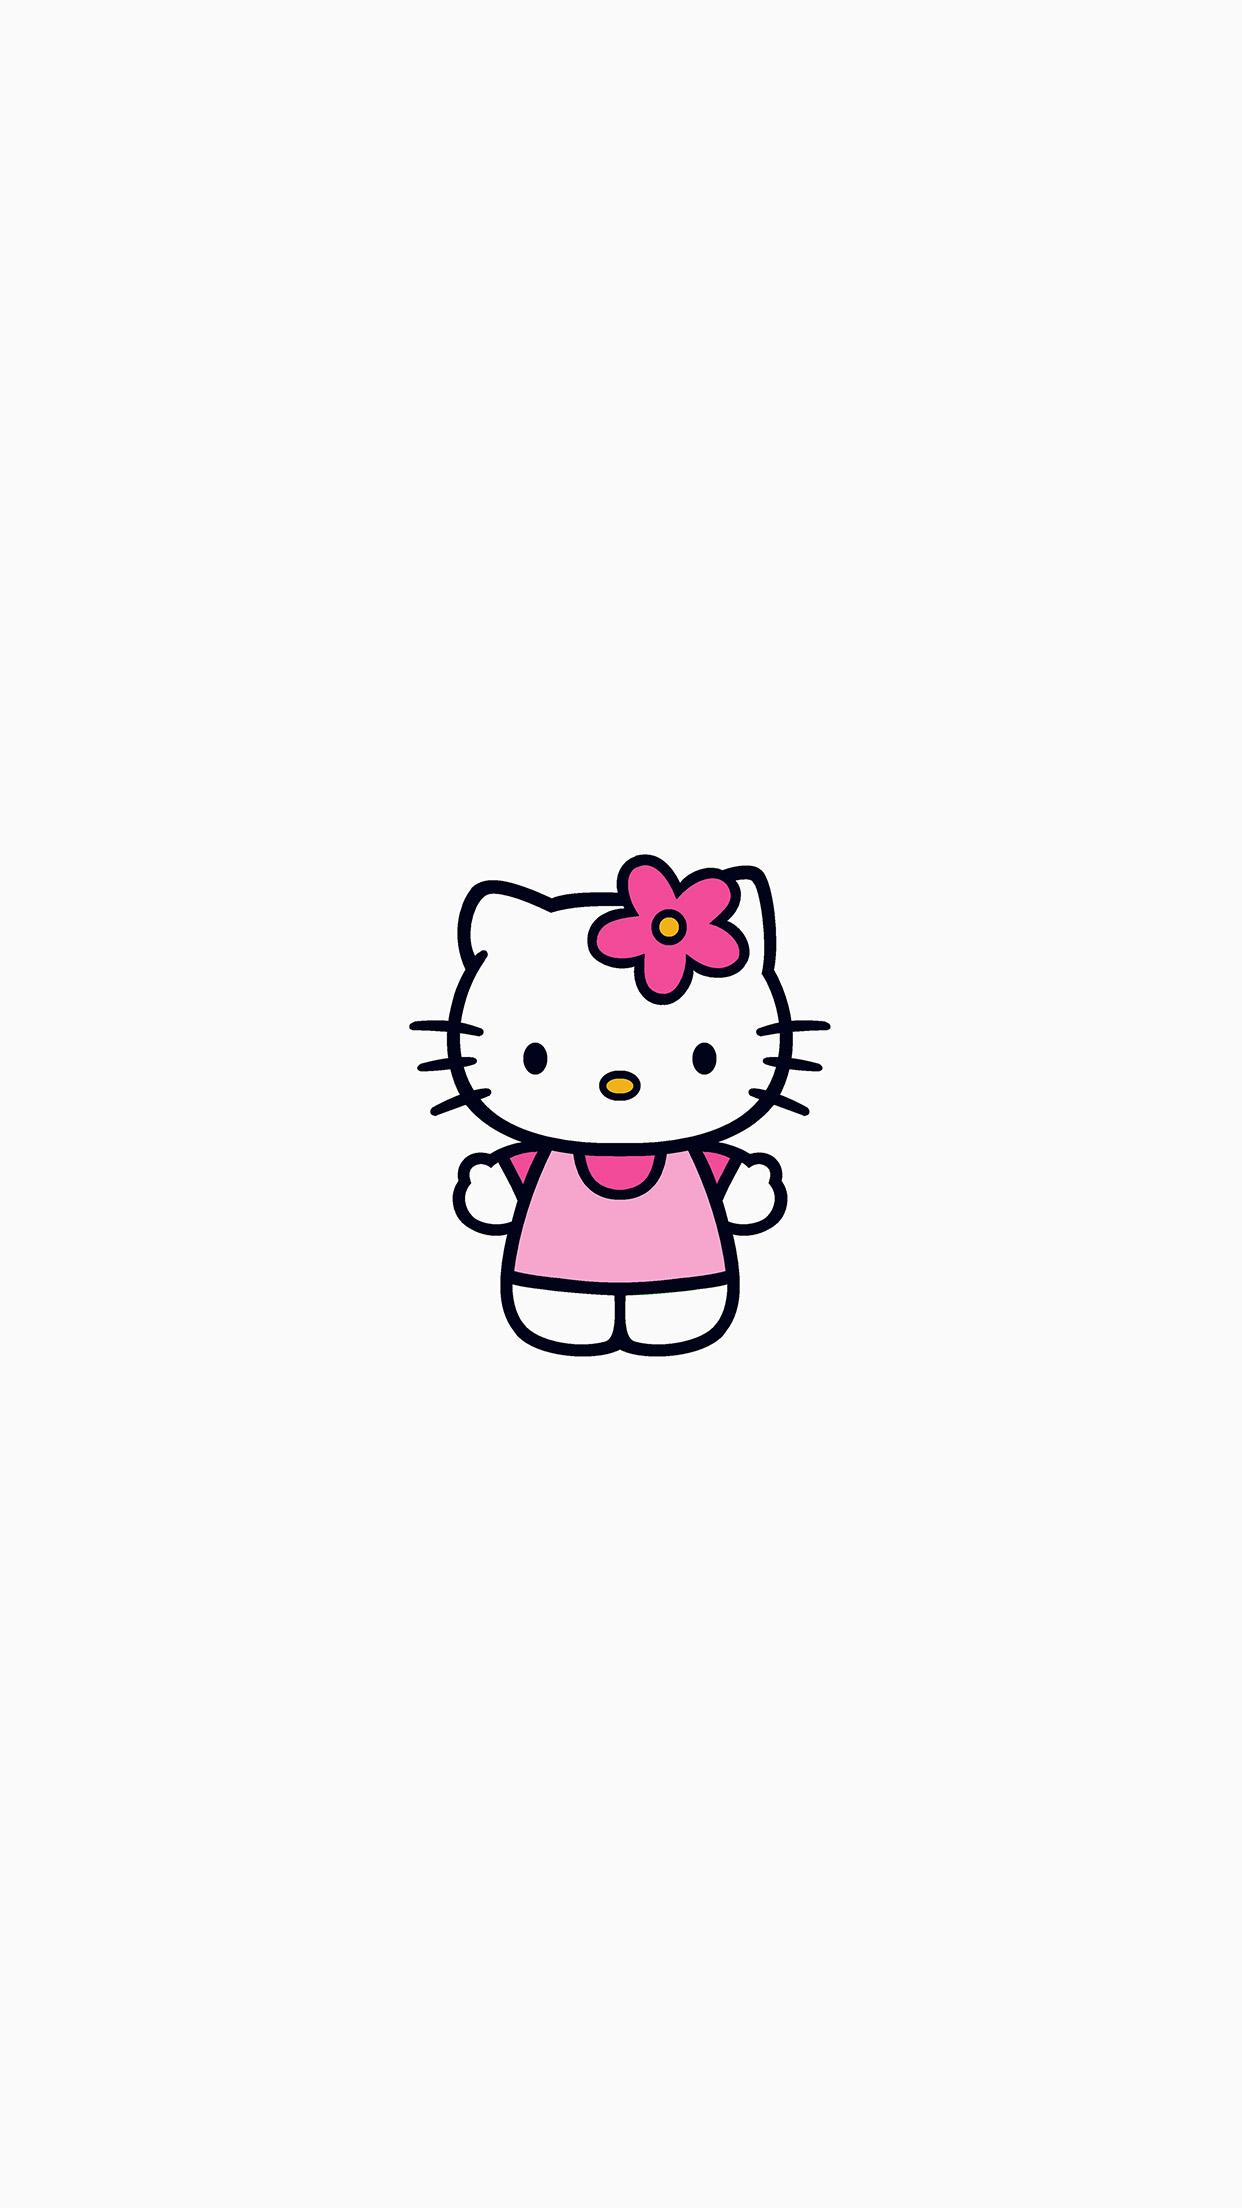 Lollipop Wallpaper Cute Ar87 Hello Kitty Logo Cute Art Illustration